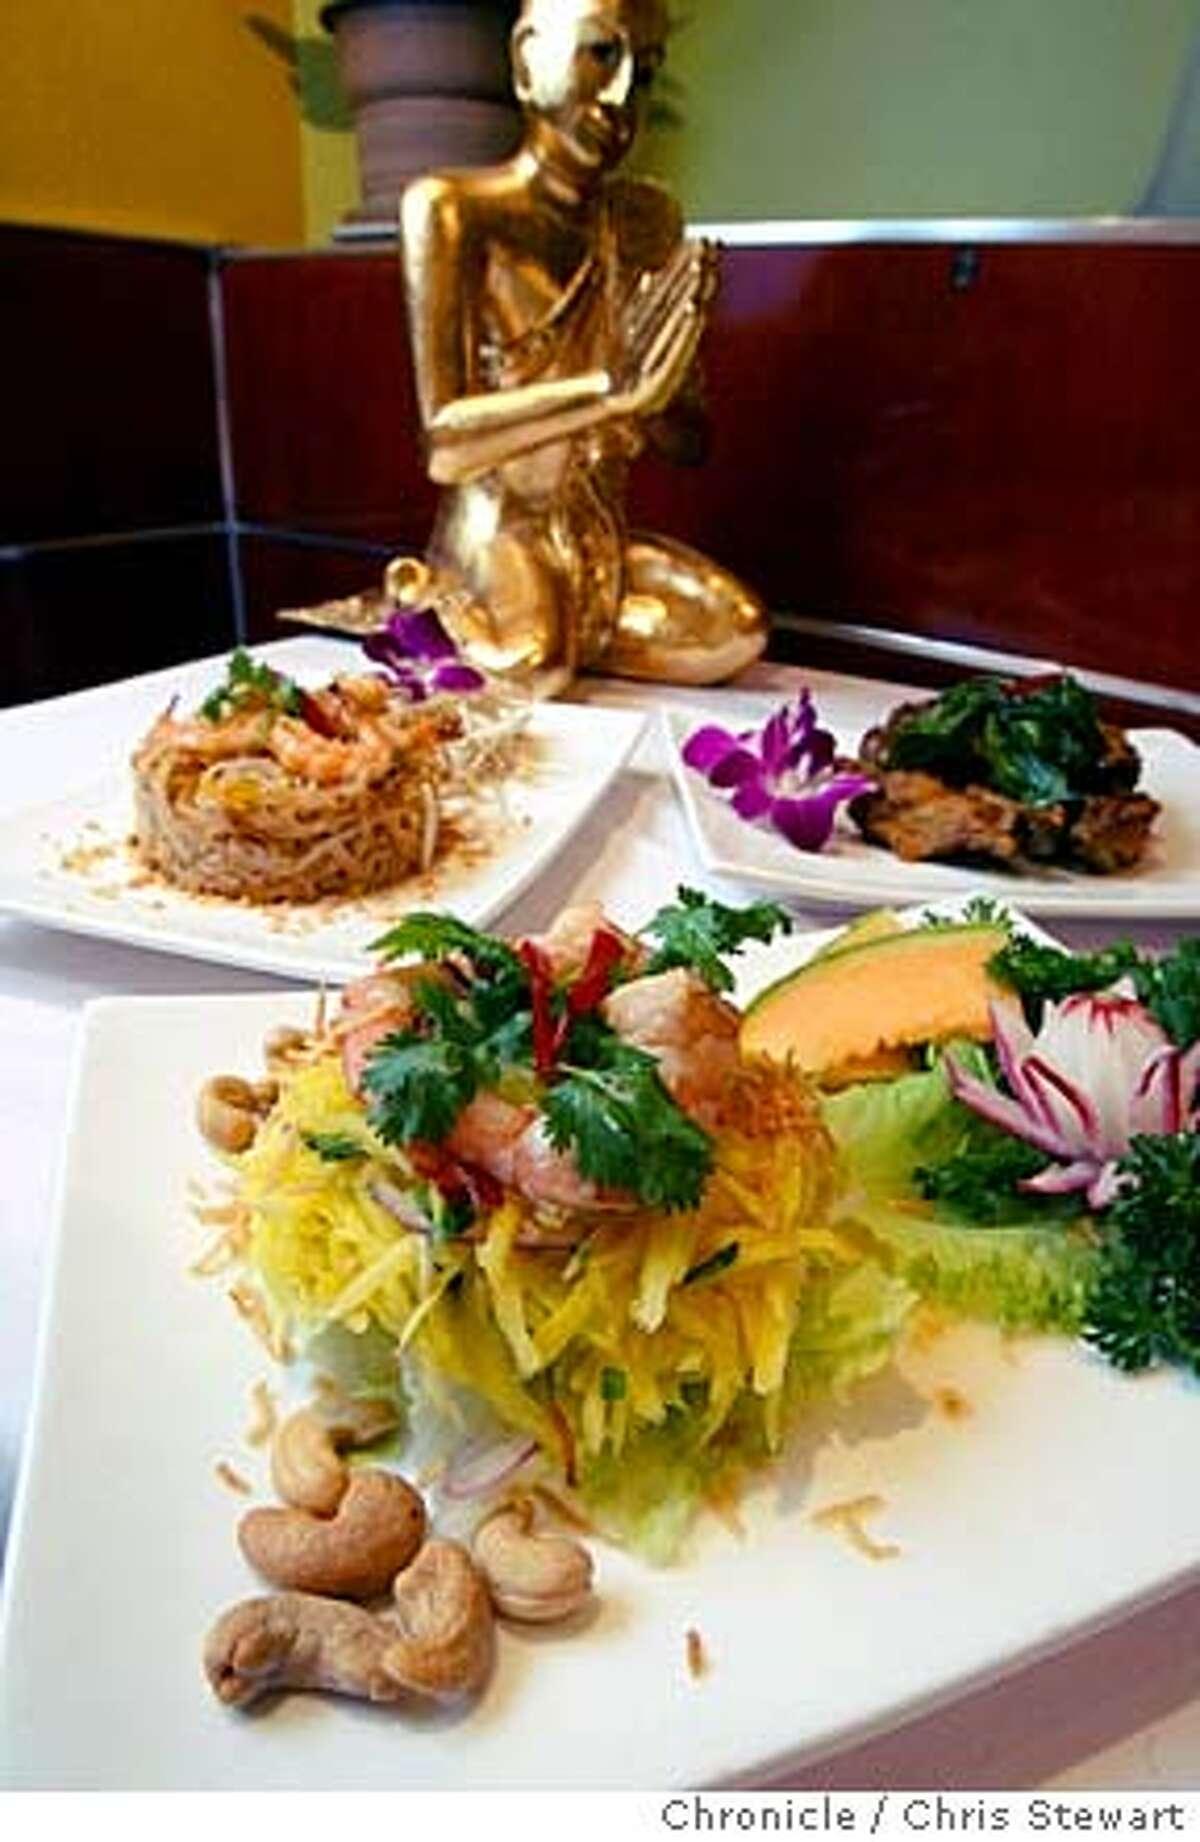 Event on 7/16/04 in San Francisco Marnee Thai Restaurant, 1243 Ninth Avenue, San Francisco. Chaiwatt Siriyarn, owner, holds Pad Thai, his signature dish. Chris Stewart / The Chronicle